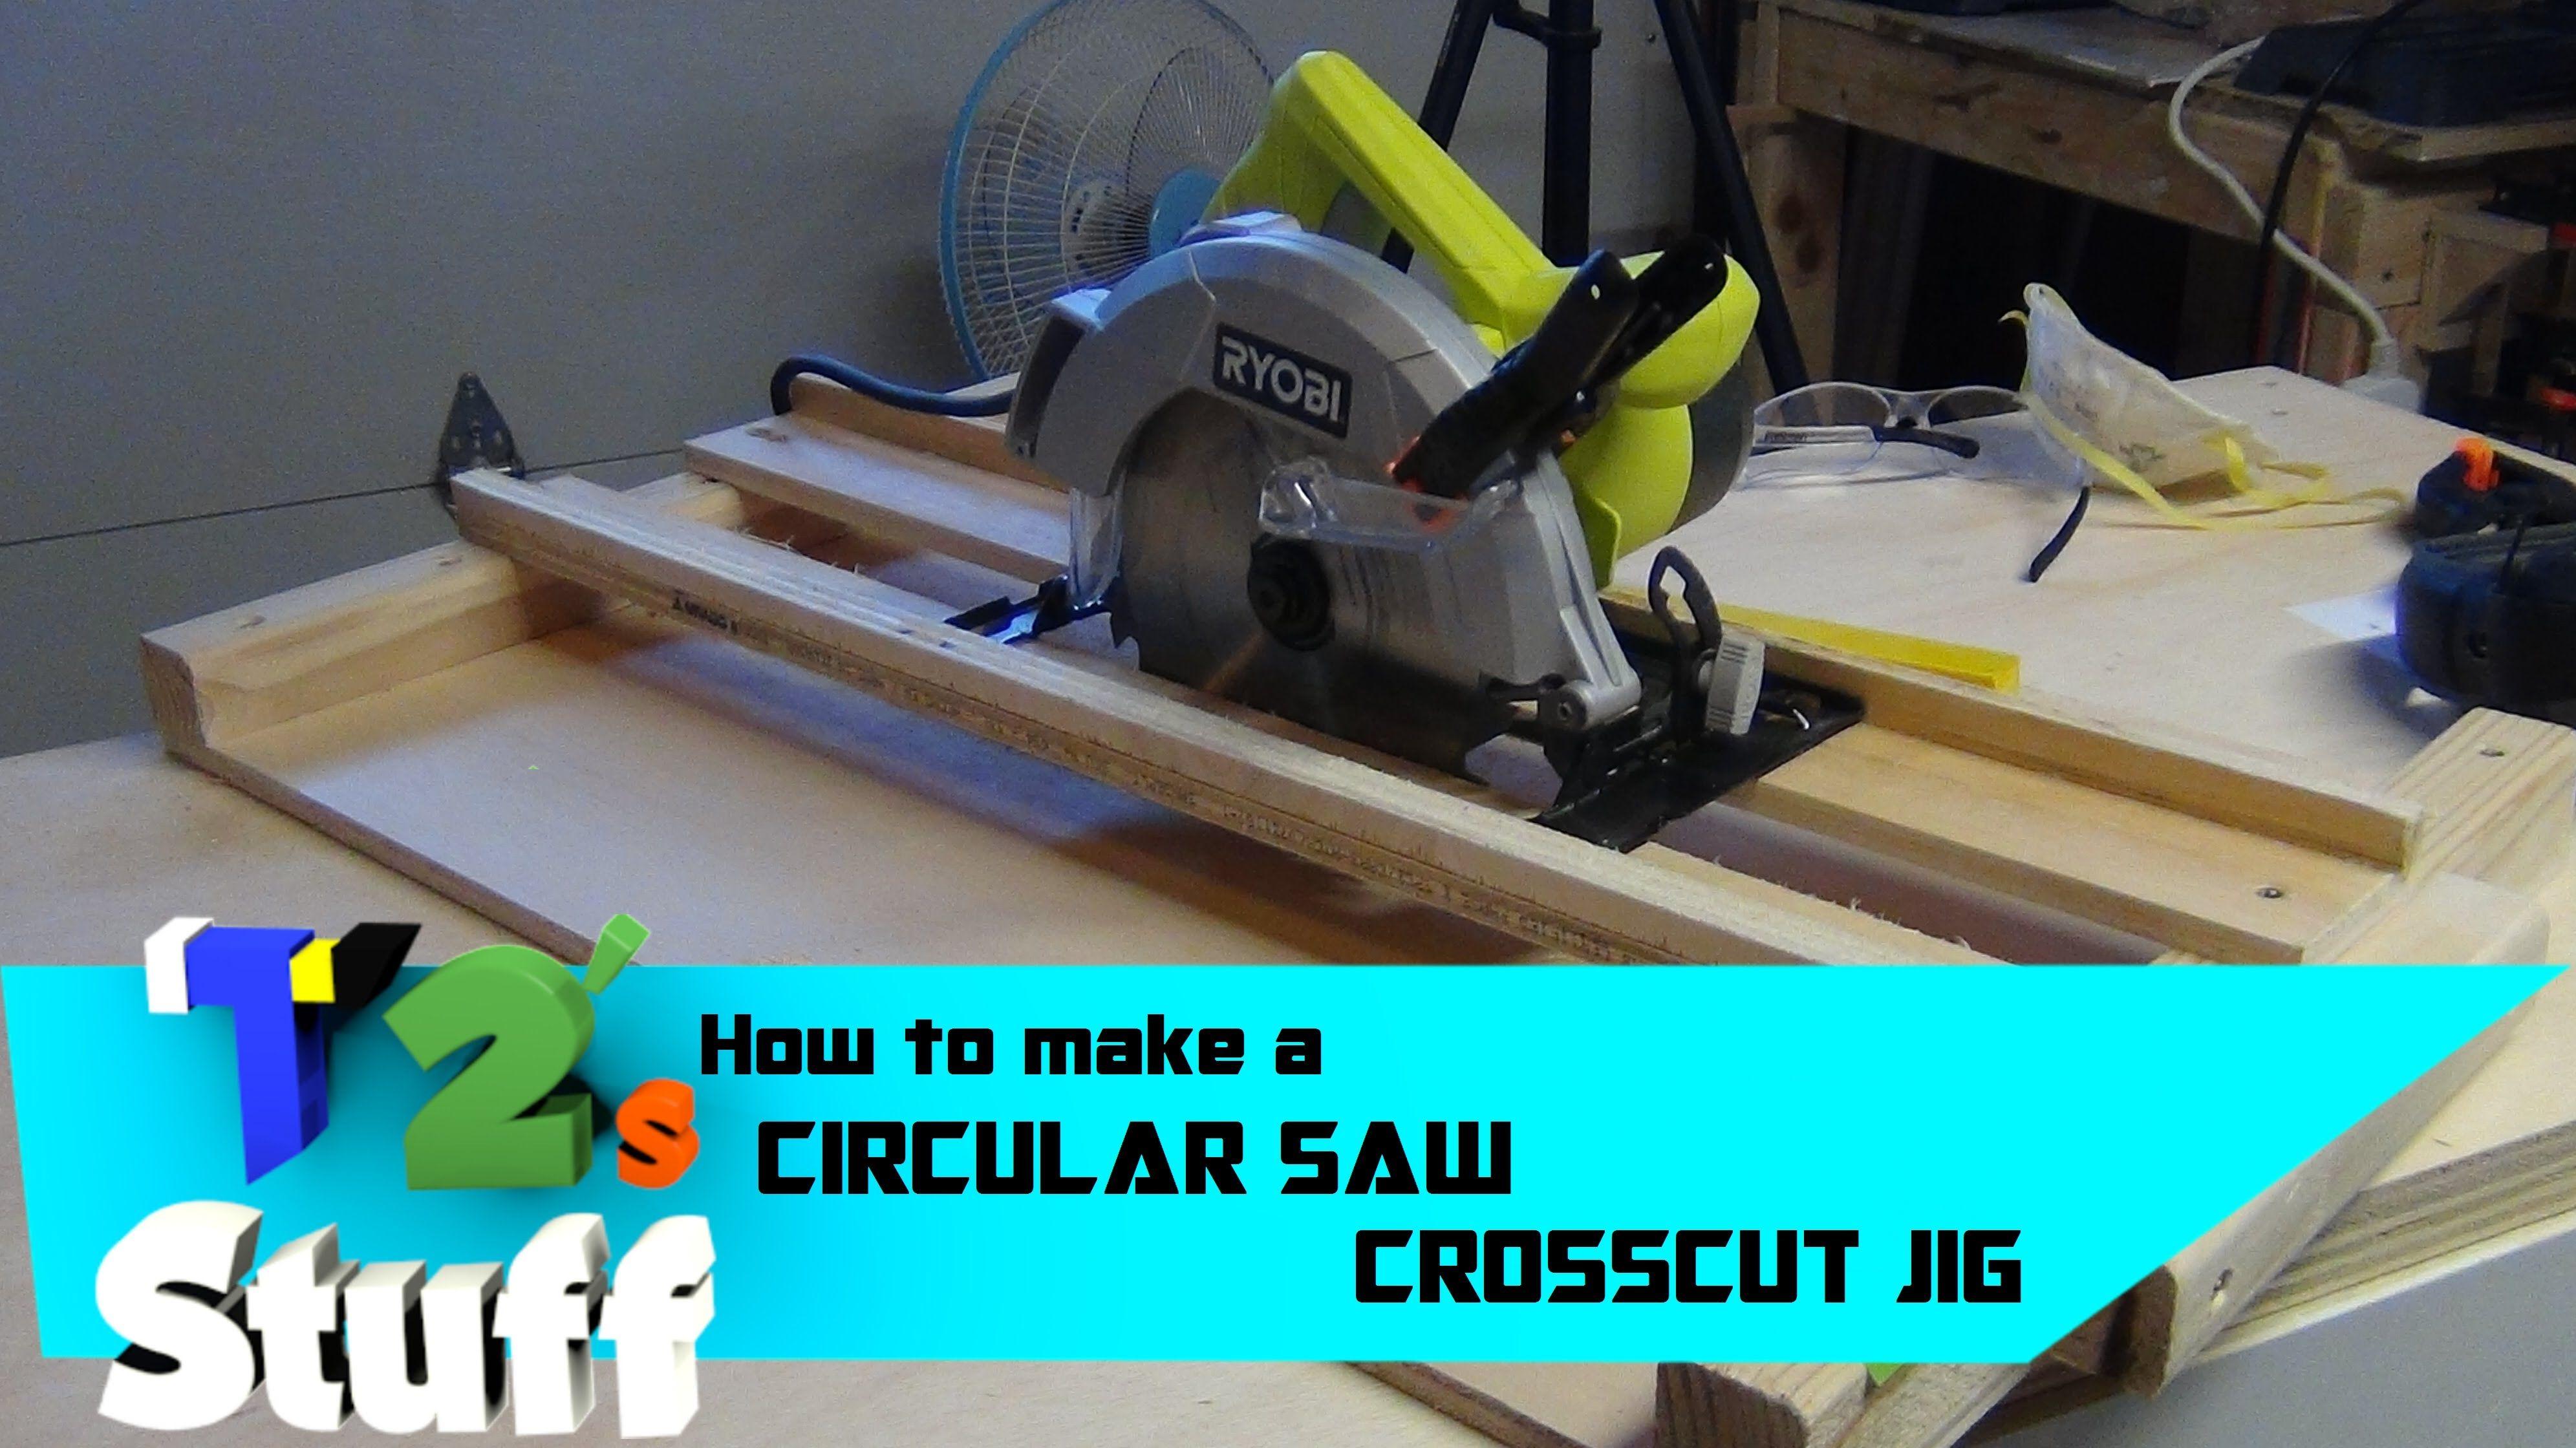 Circular Saw Crosscut Jig How To Circular Saw Circular Saw Jig Circular